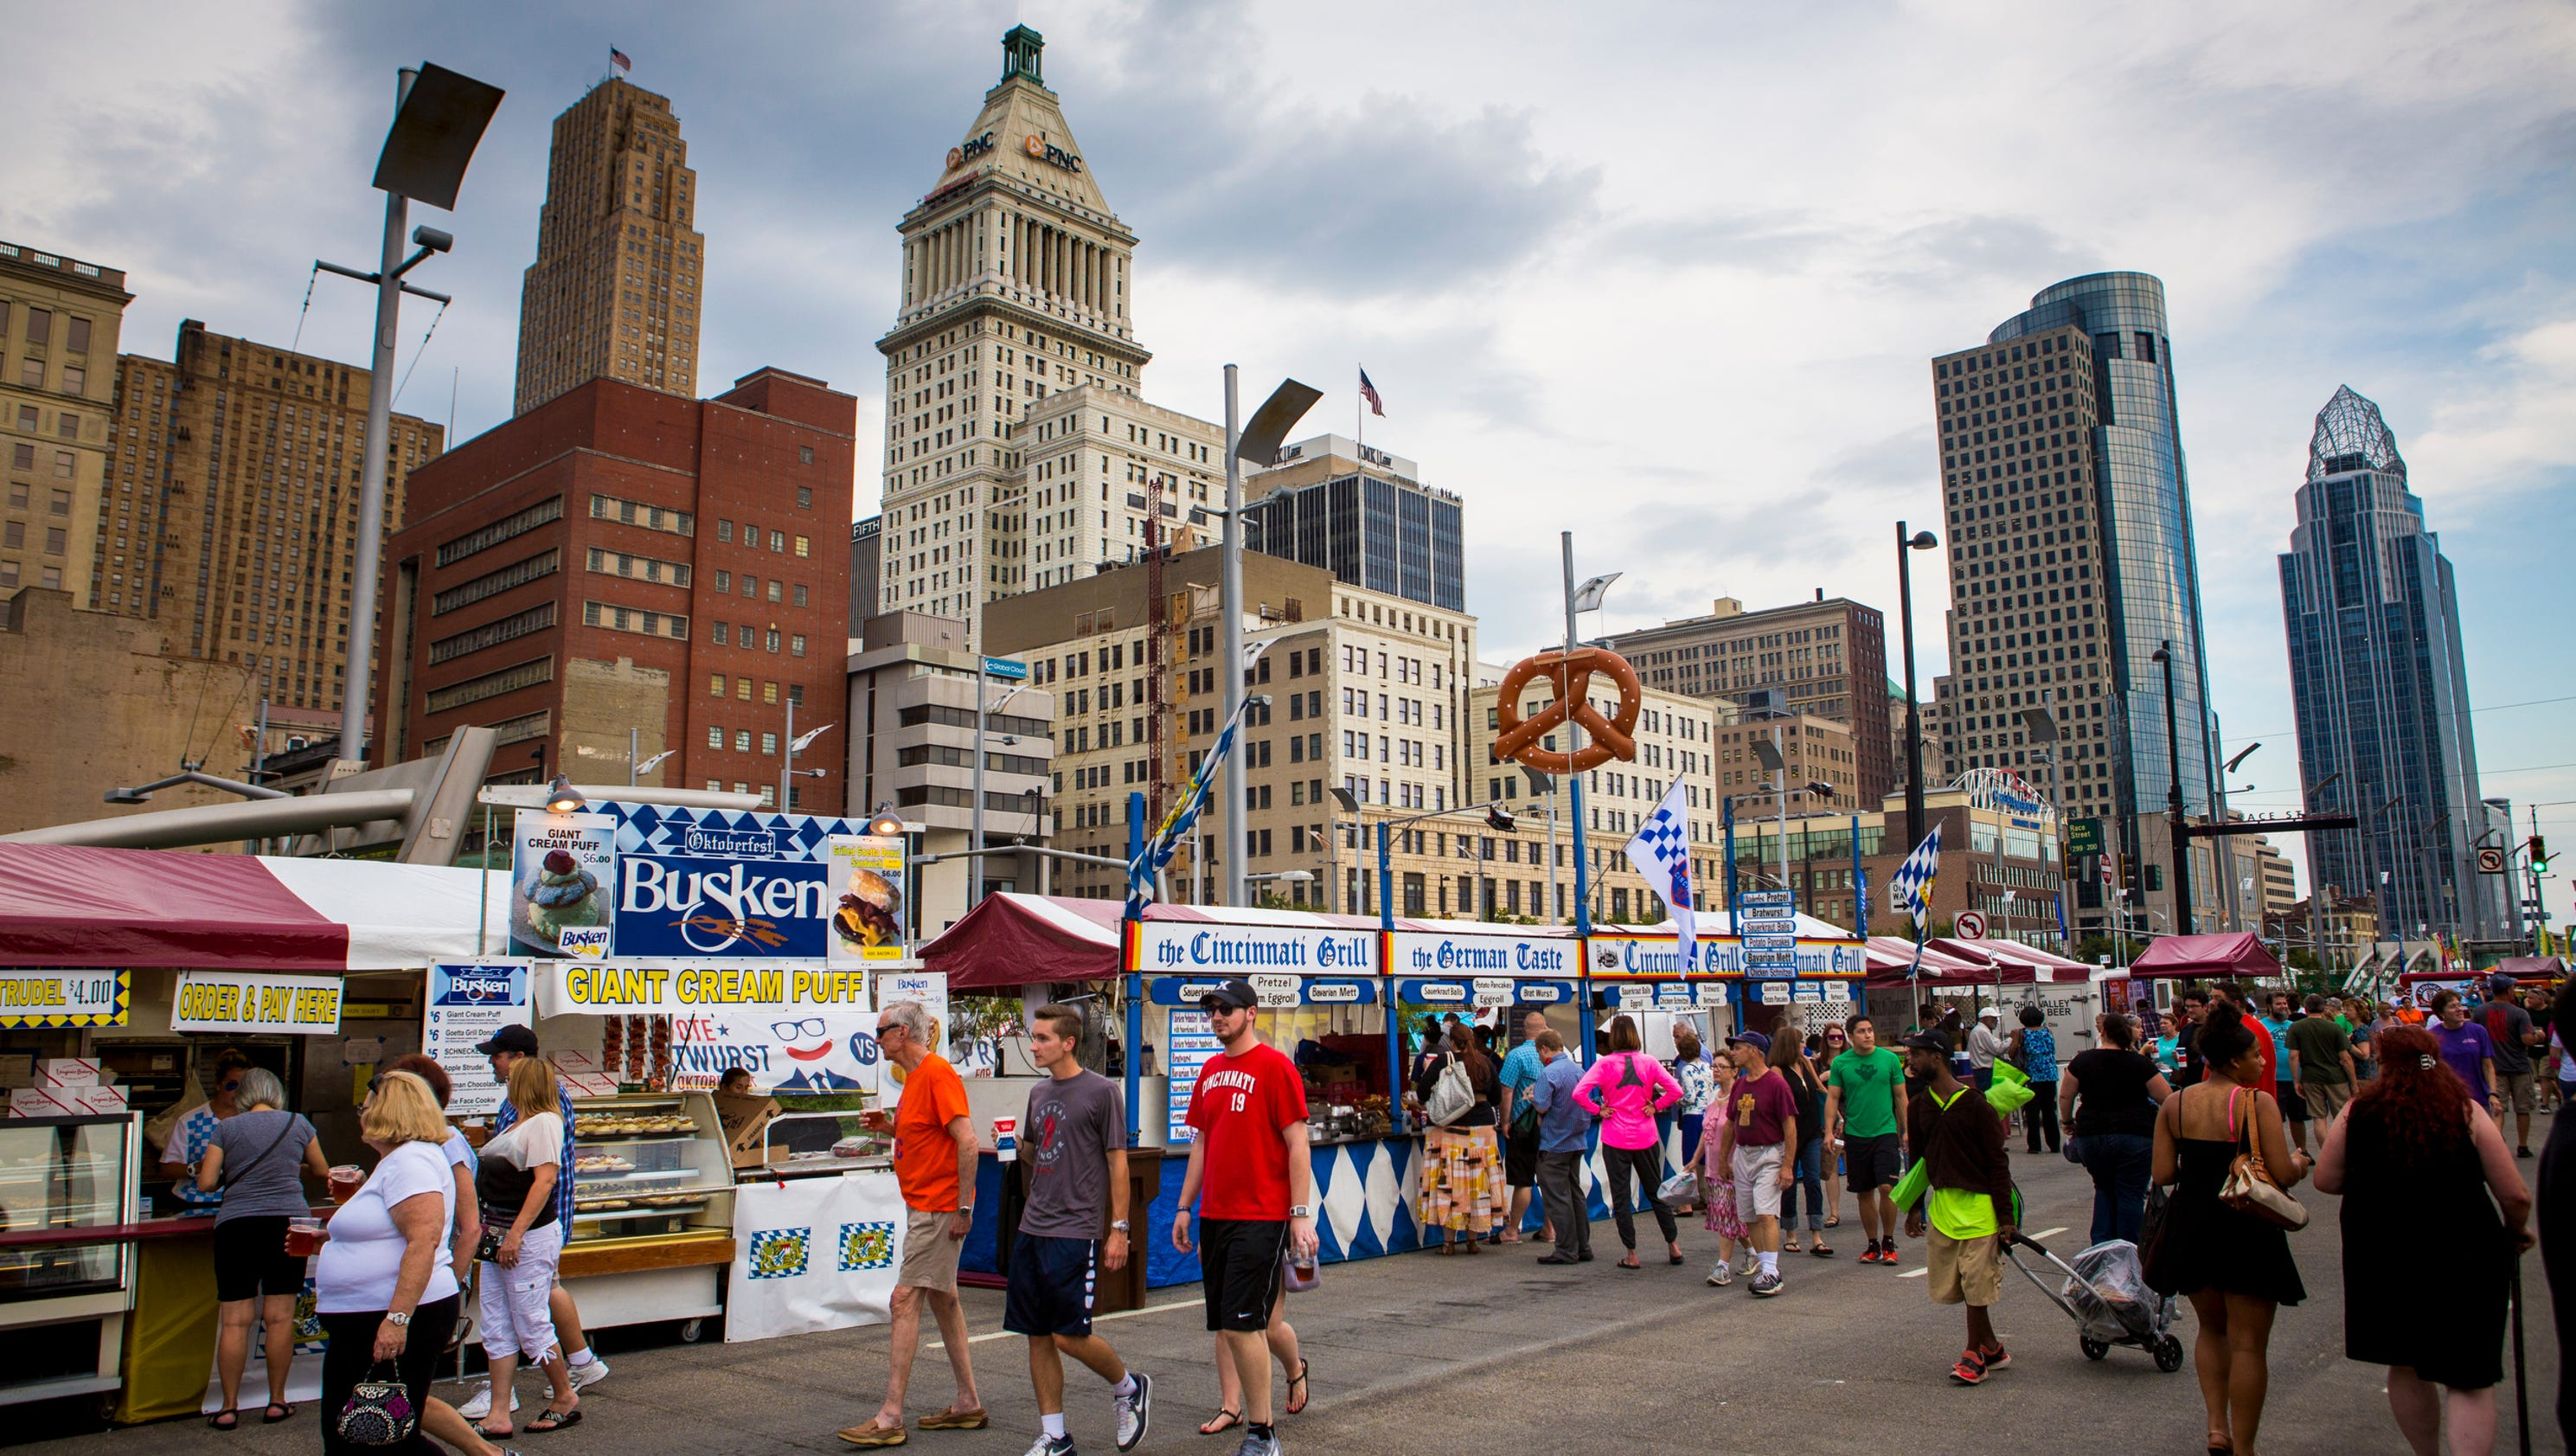 Study Cincinnati is the best place in America for Oktoberfest